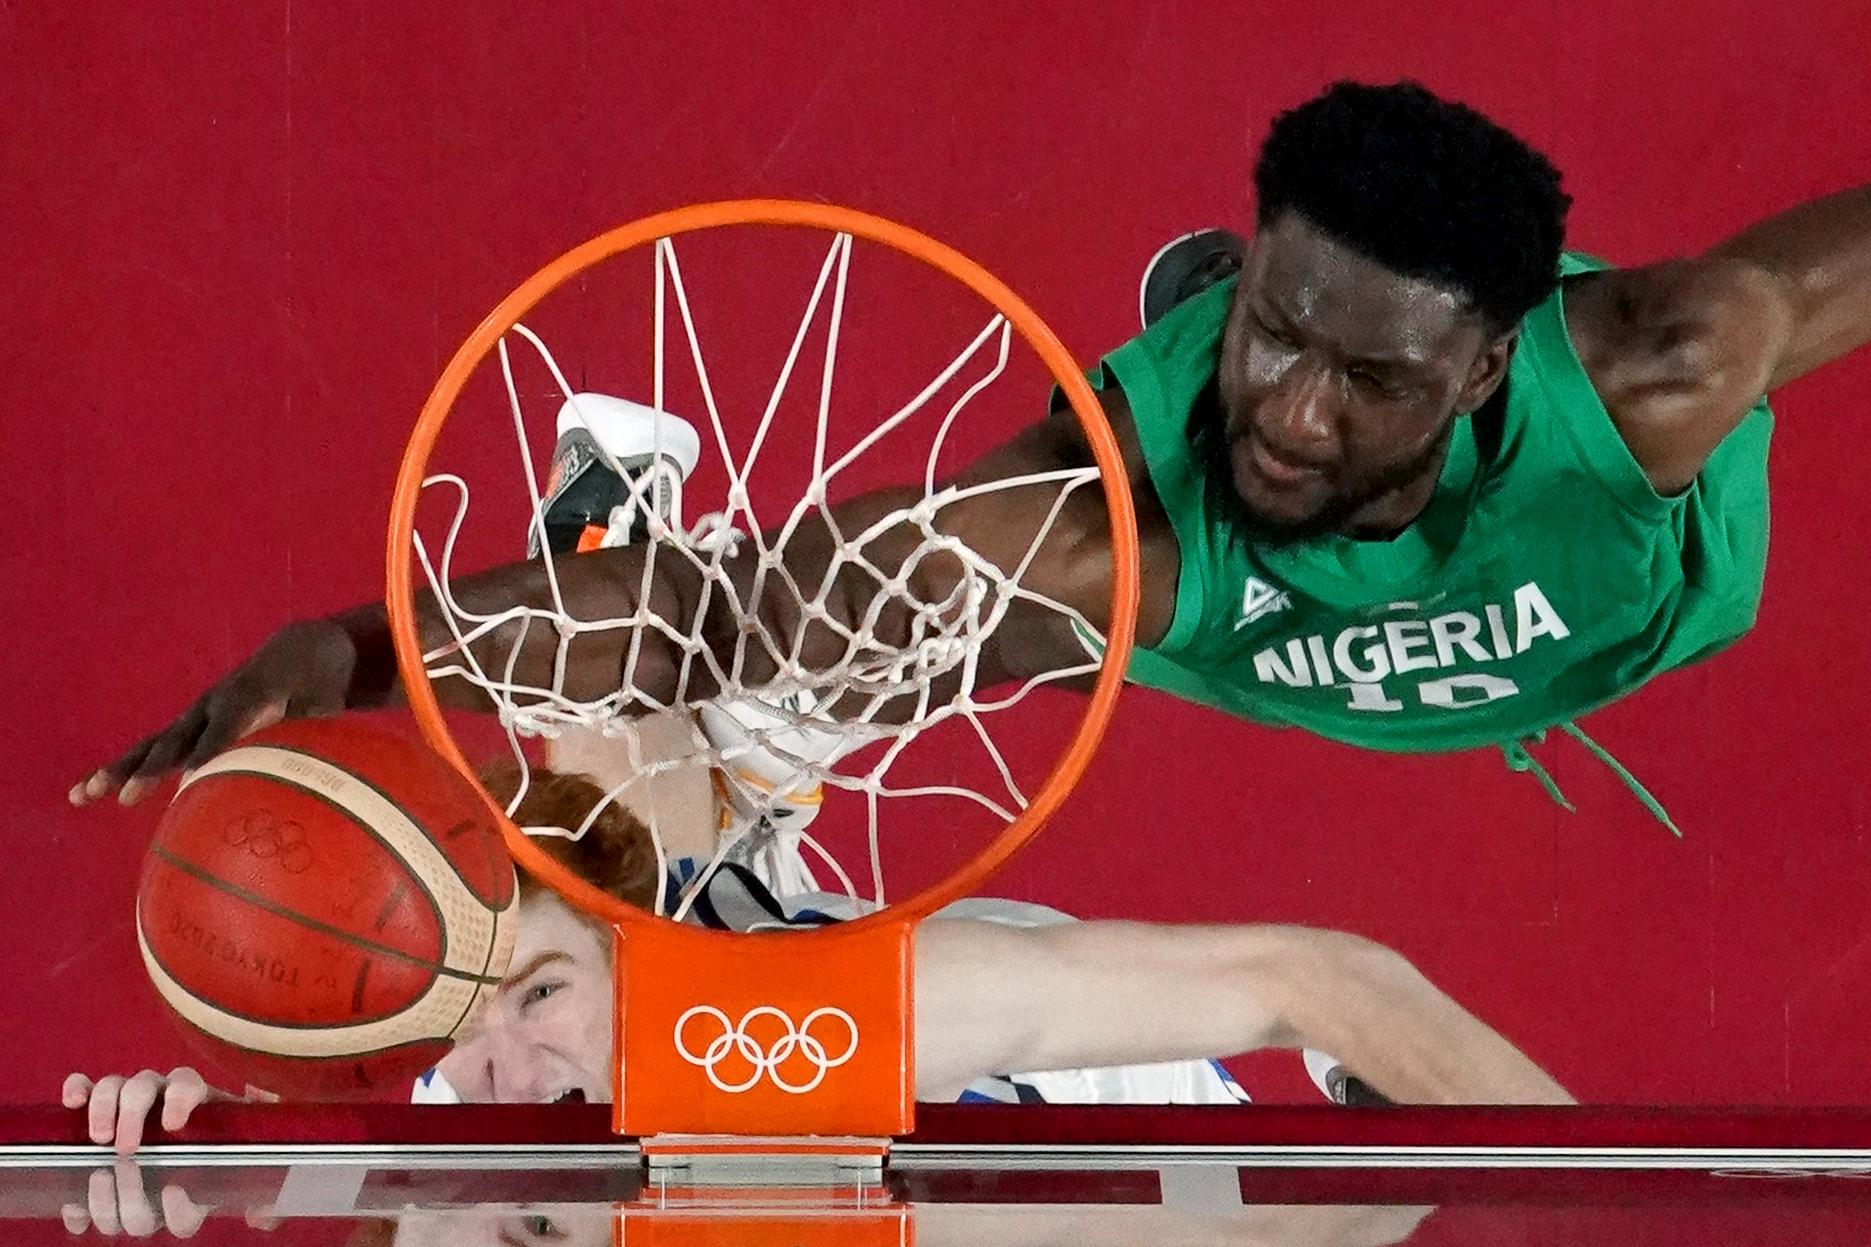 Tokyo 2020 Olympics - Basketball - Men - Group B - Italy v Nigeria - Saitama Super Arena, Saitama, Japan - July 31, 2021. Chimezie Metu of Nigeria in action at the rim with Nicolo Mannion of Italy REUTERS/Brian Snyder